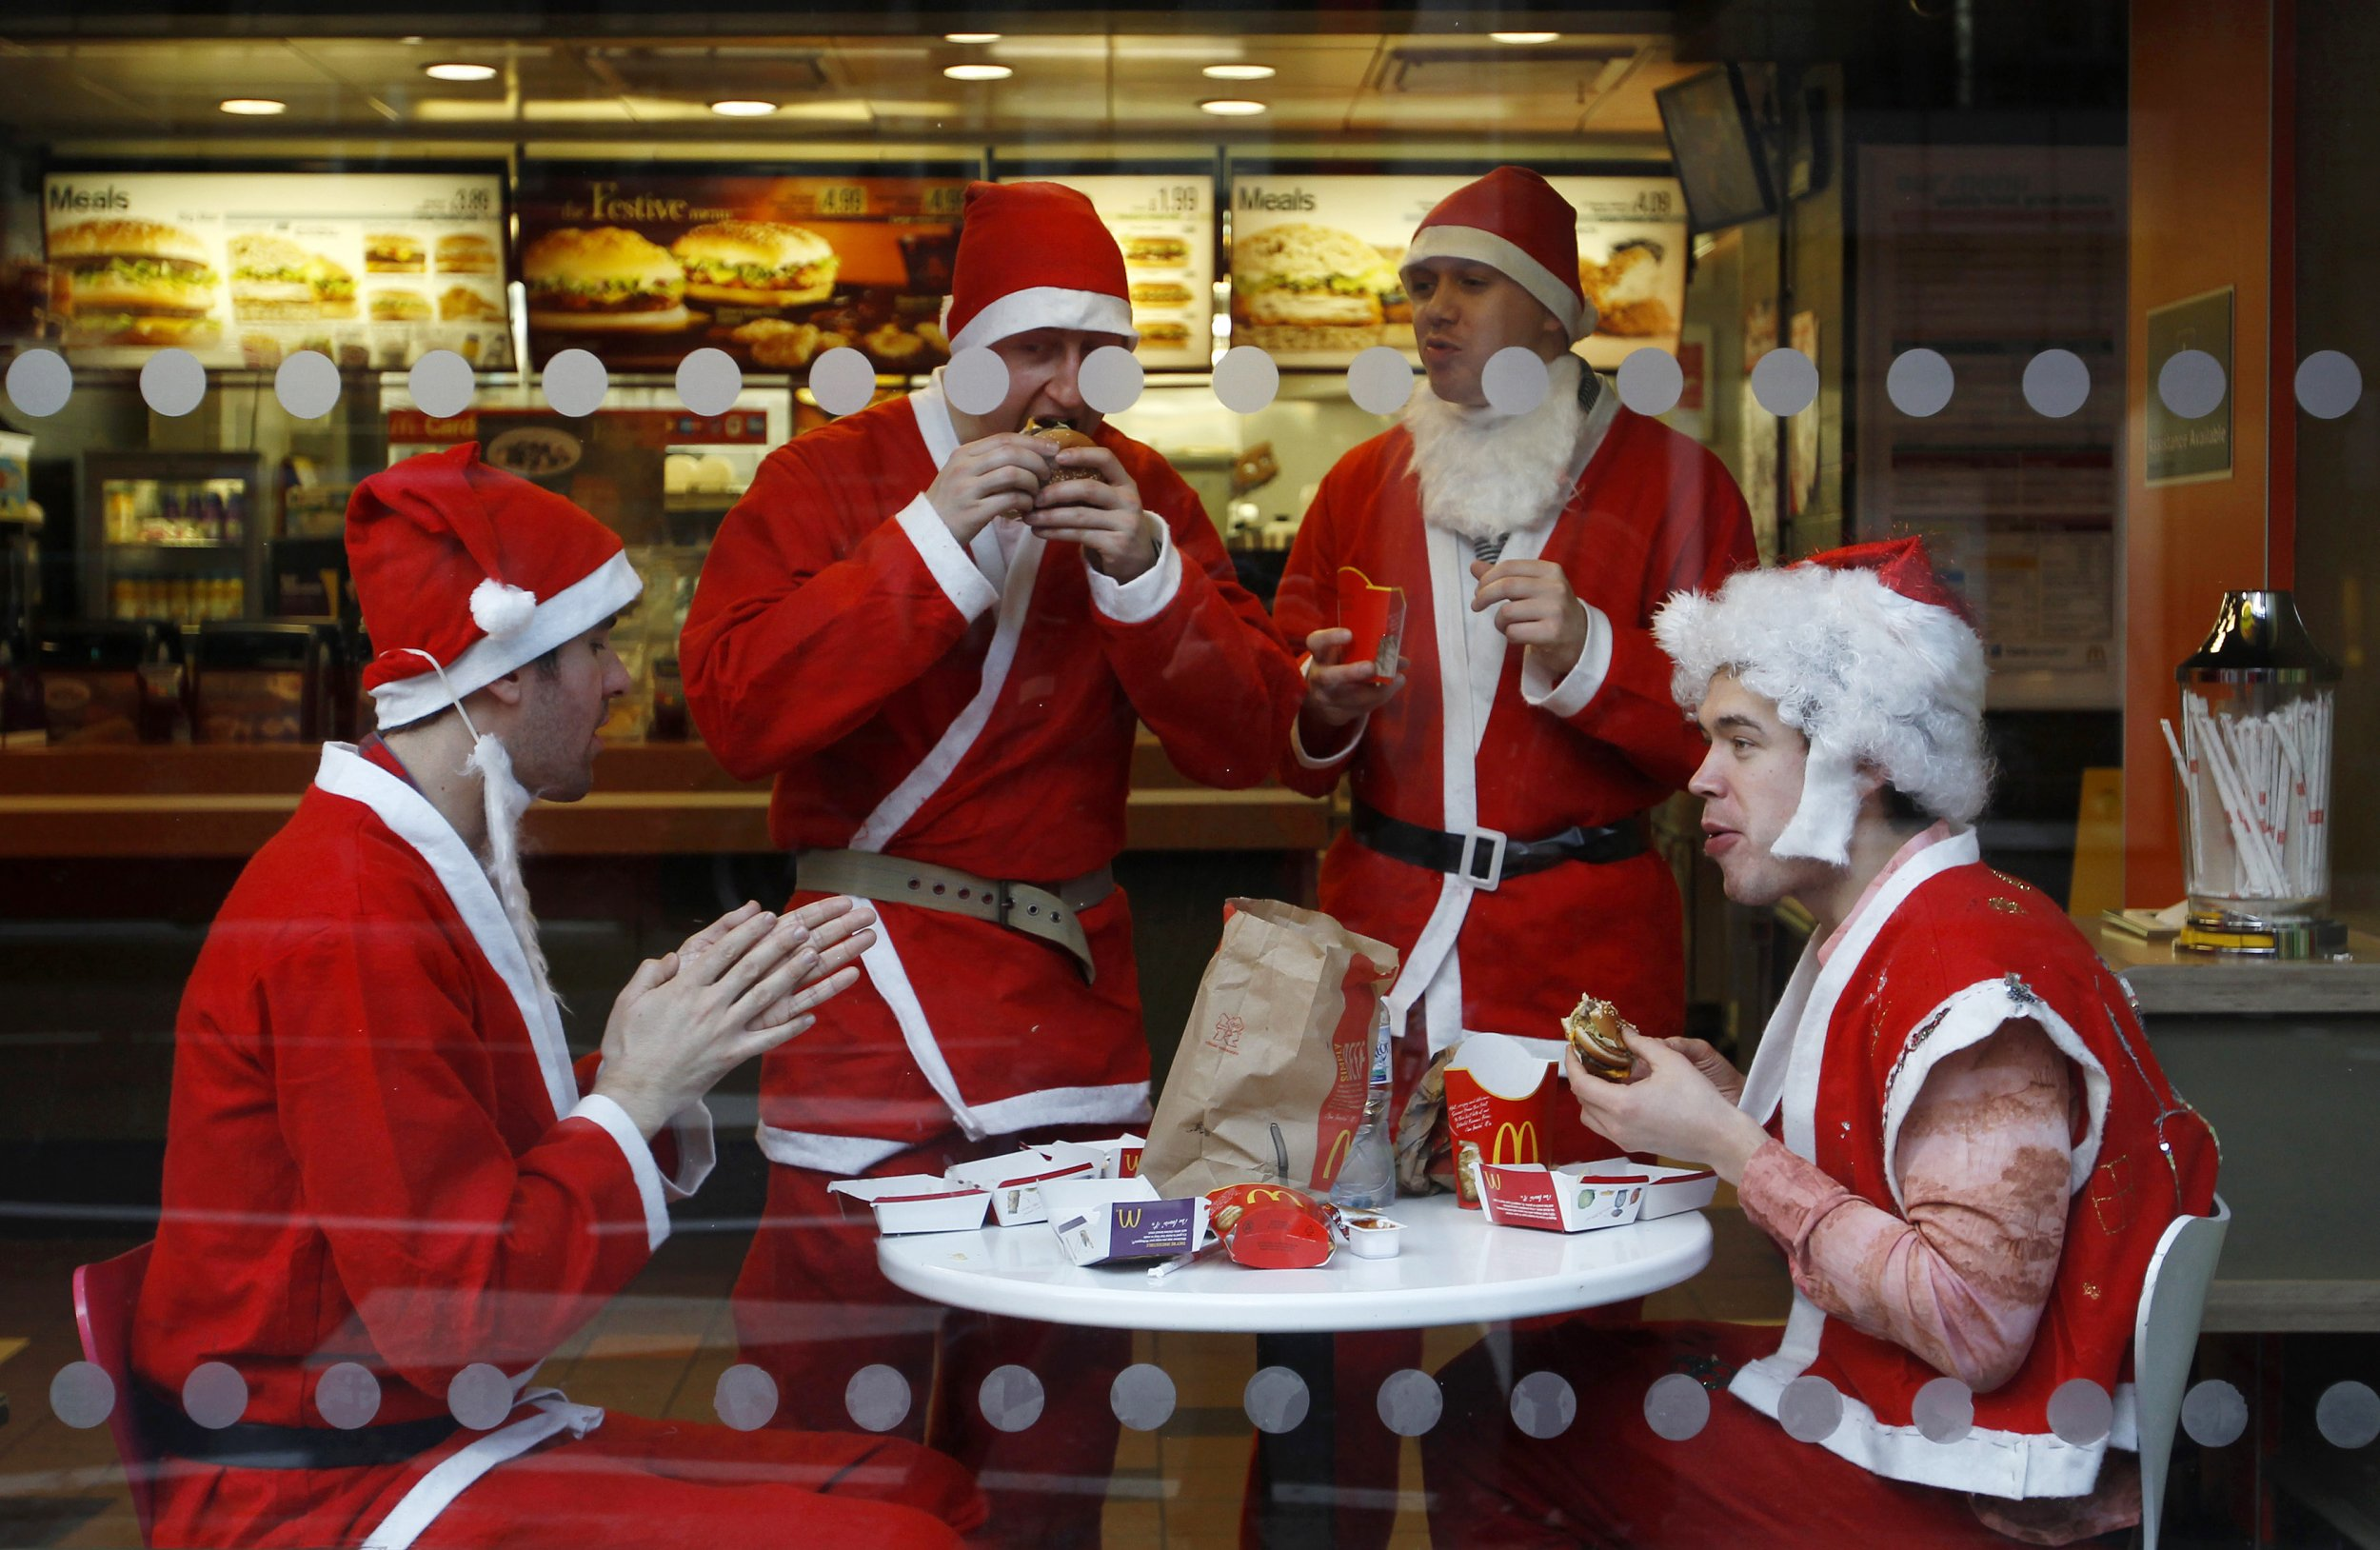 Restaurants open on christmas eve 2017 mcdonald 39 s for What restaurants are open on christmas eve